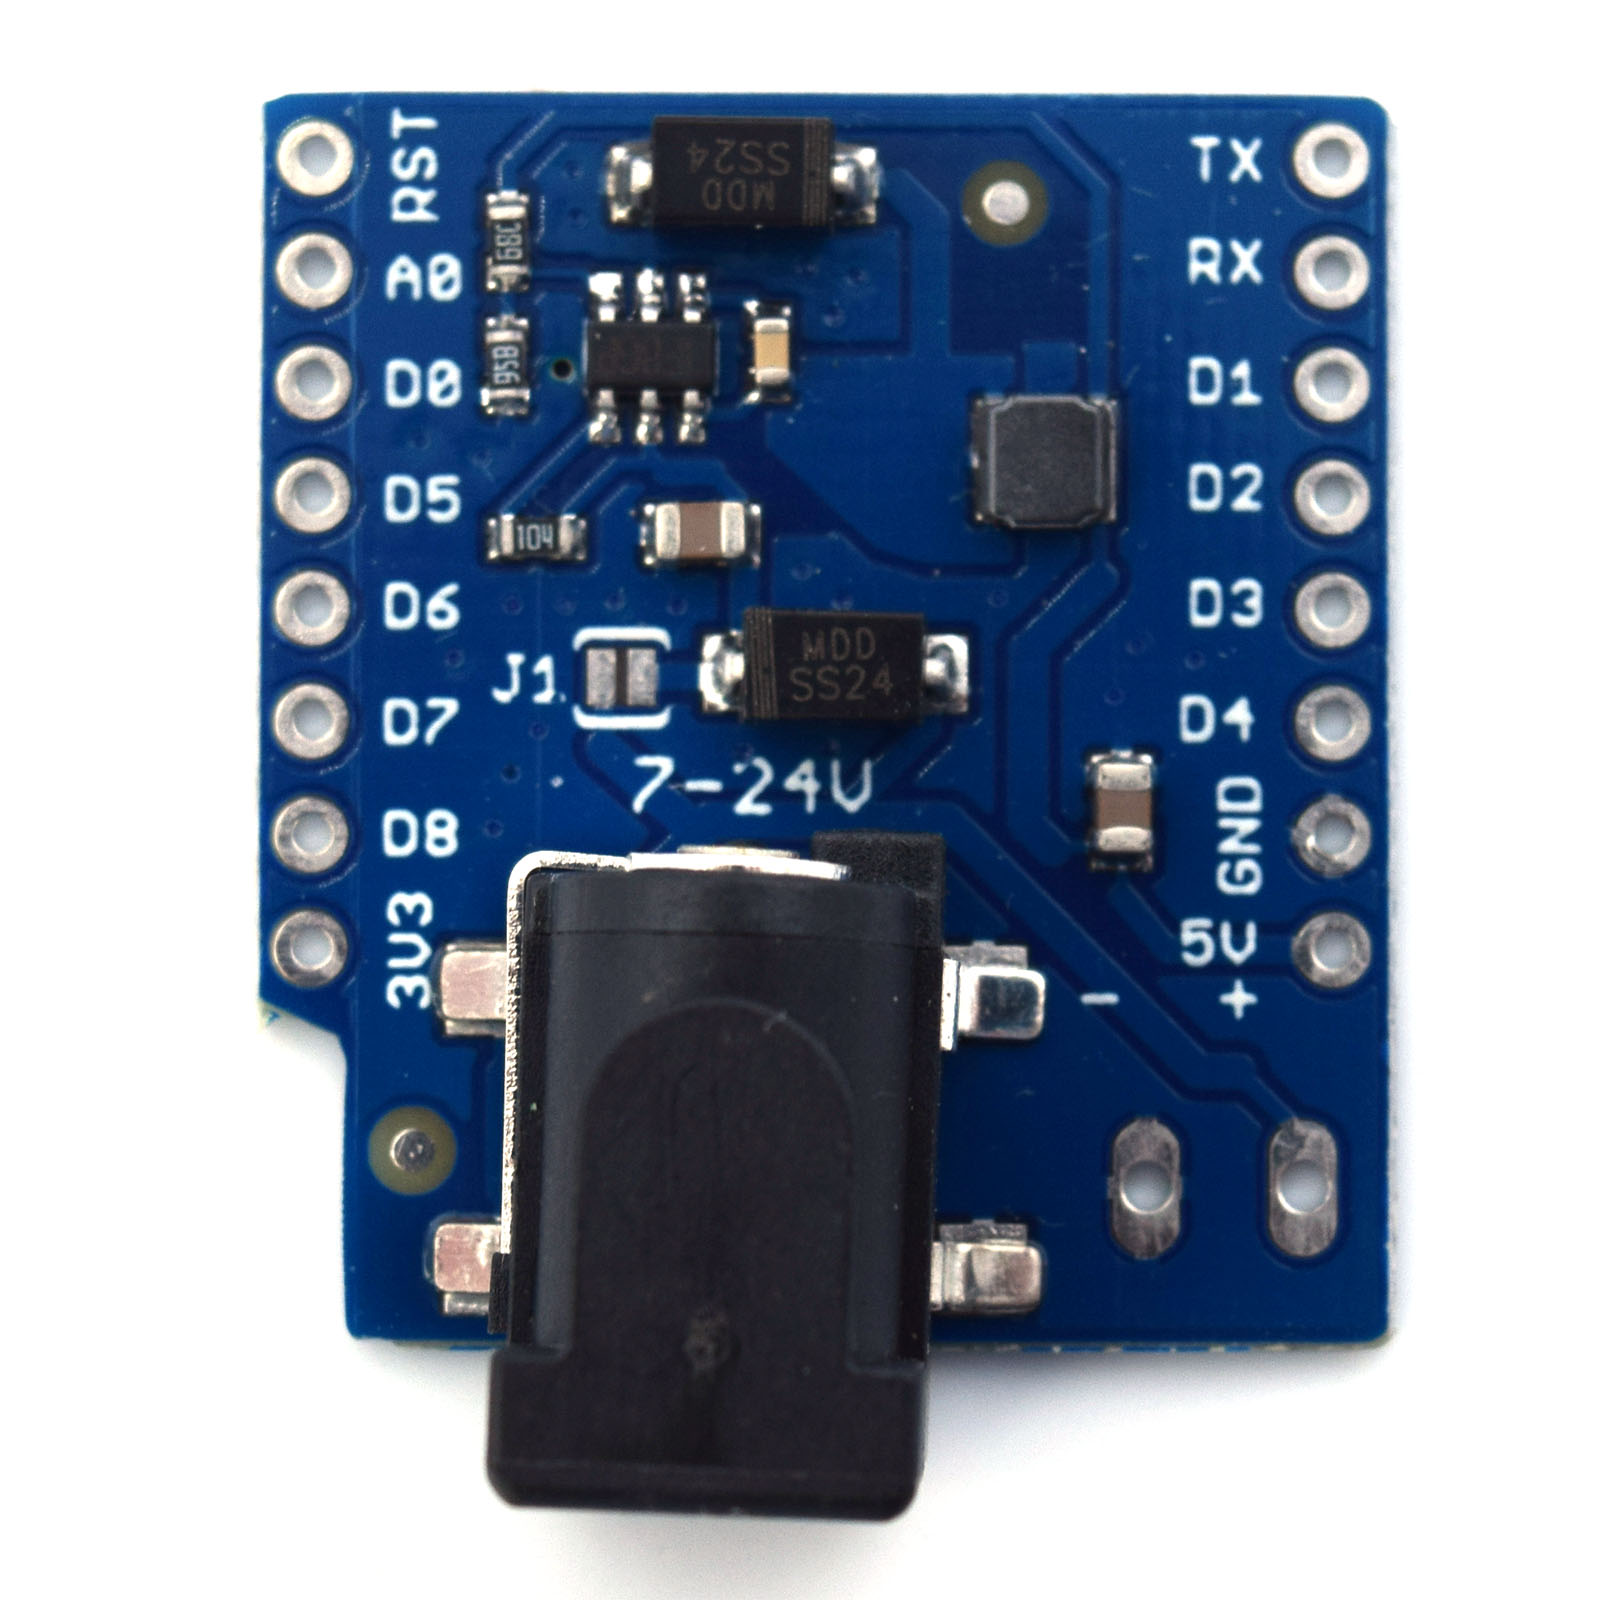 D1 Pro Mini 4MB 16MB Flash ESP8266 Wifi Modul Board wahlweise mit Antenne